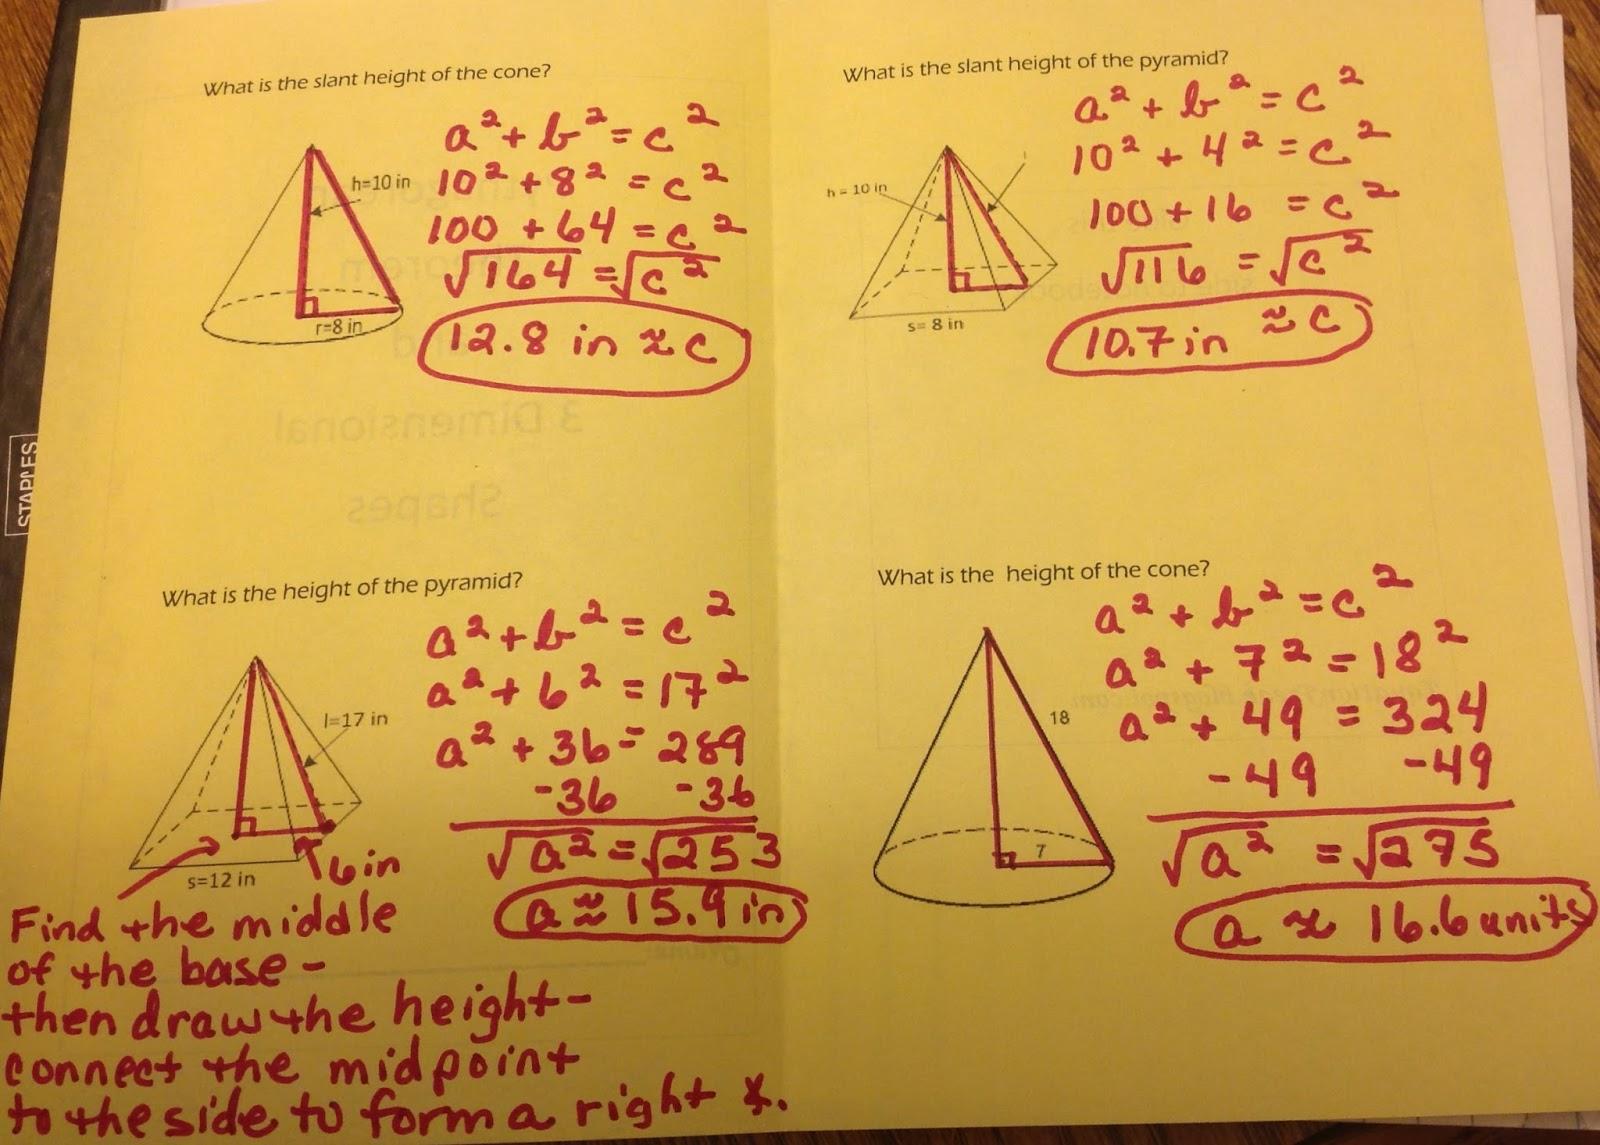 Equation Freak 8 G B 7 Pythagorean Theorem And 3 Dimensional Shapes